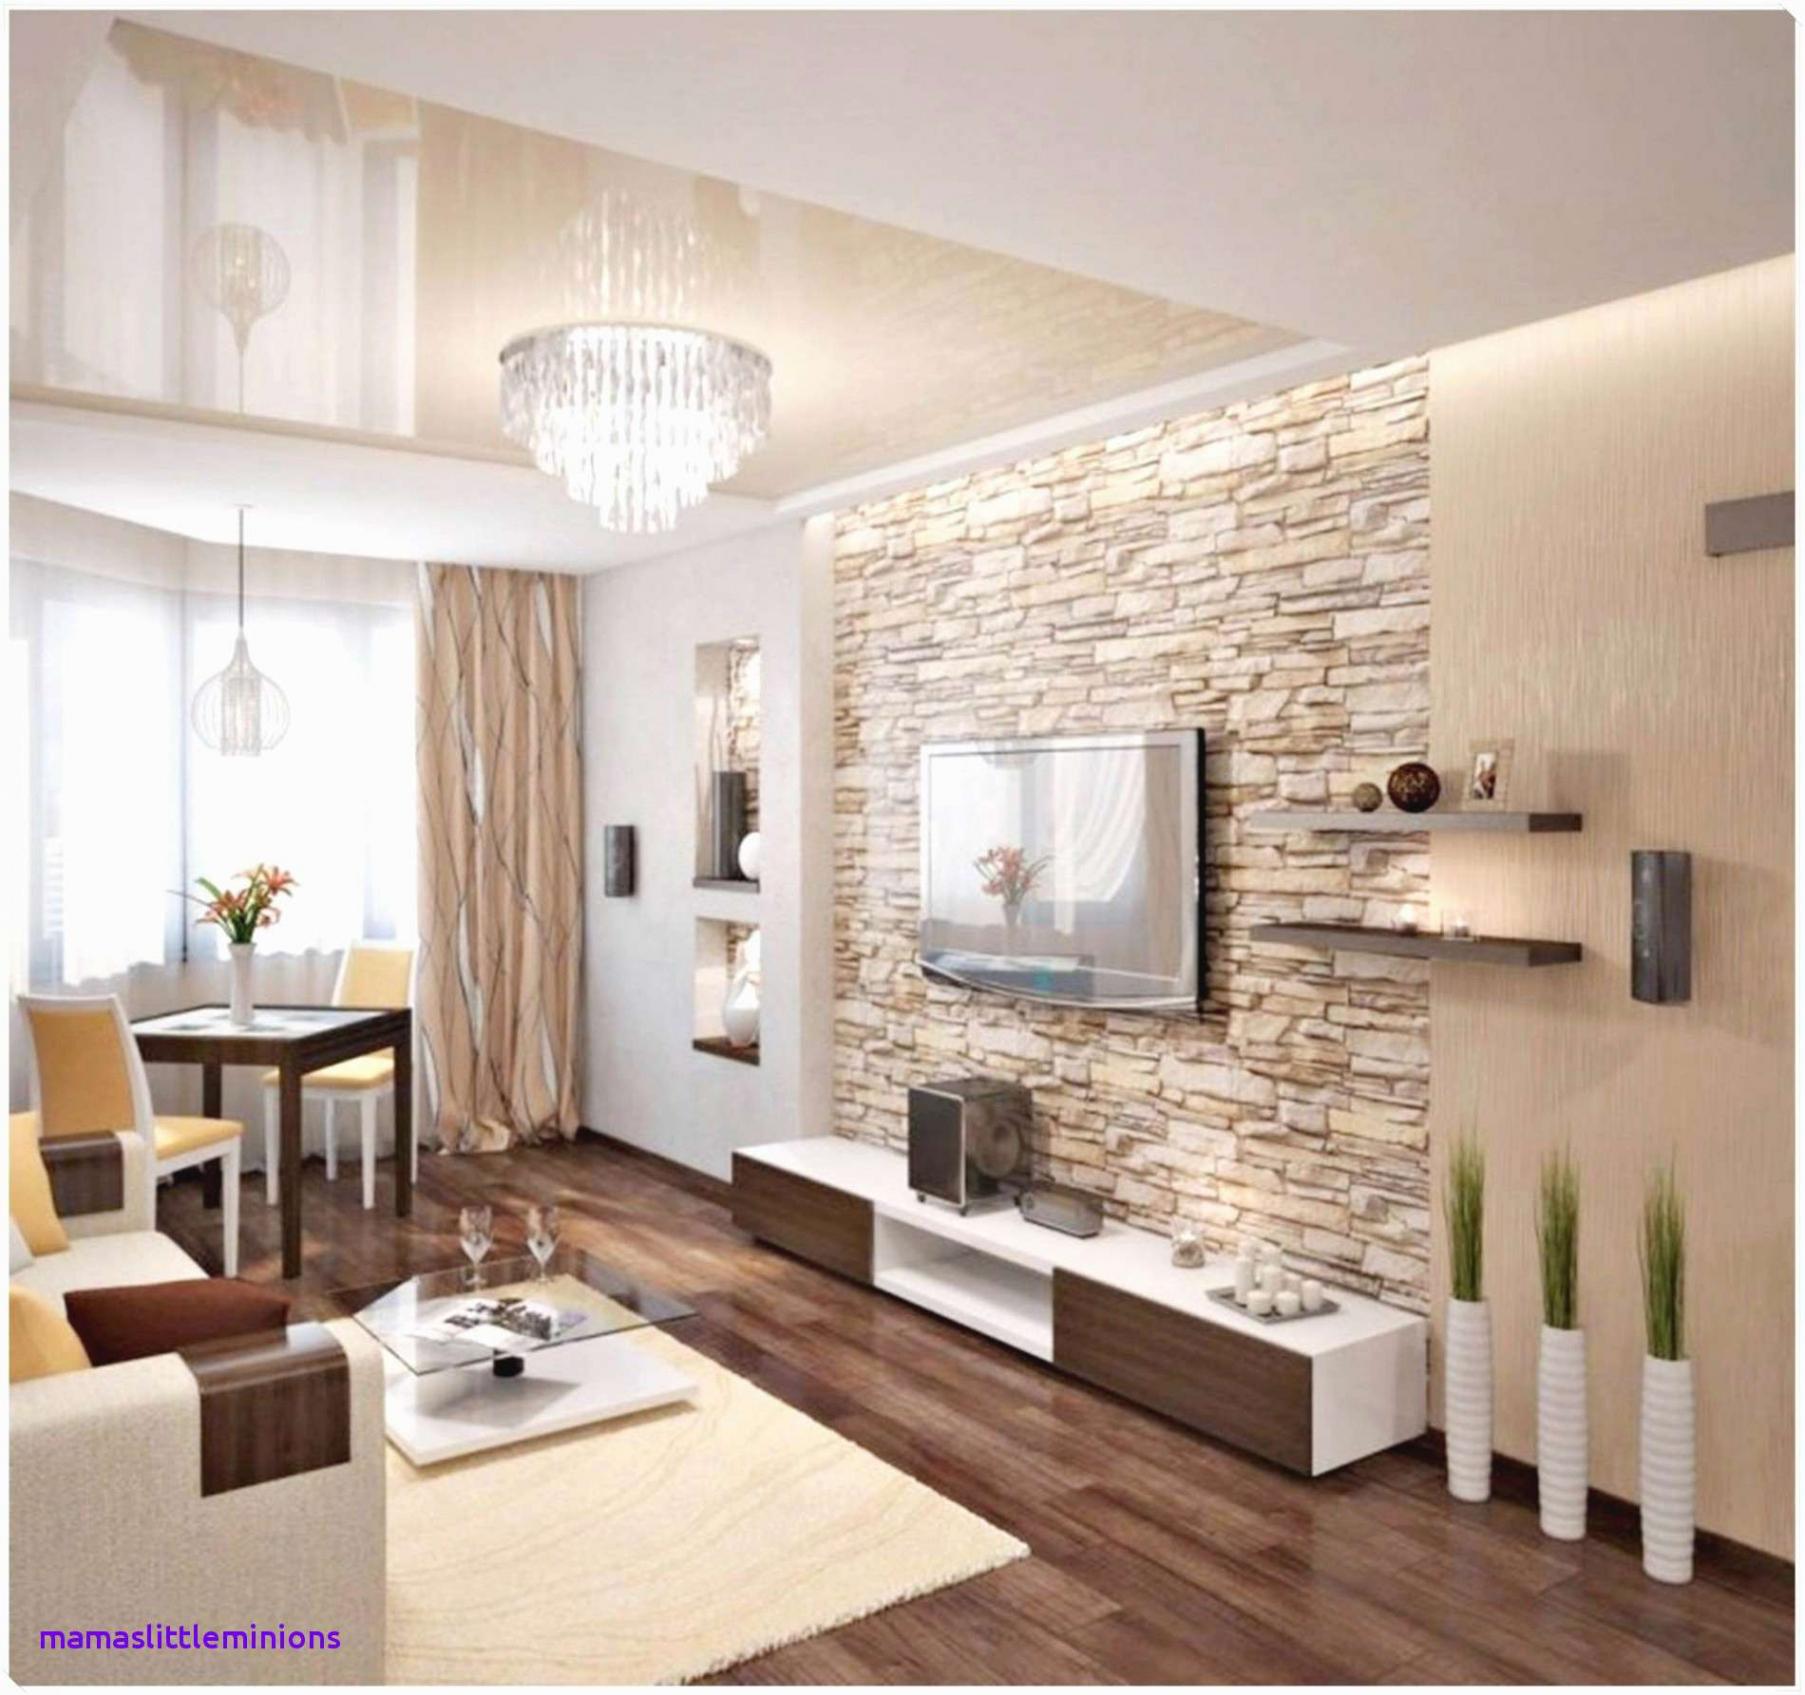 45 luxus deko ideen kuche galerie kuchen fur dachgeschosswohnungen kuchen fur dachgeschosswohnungen 10